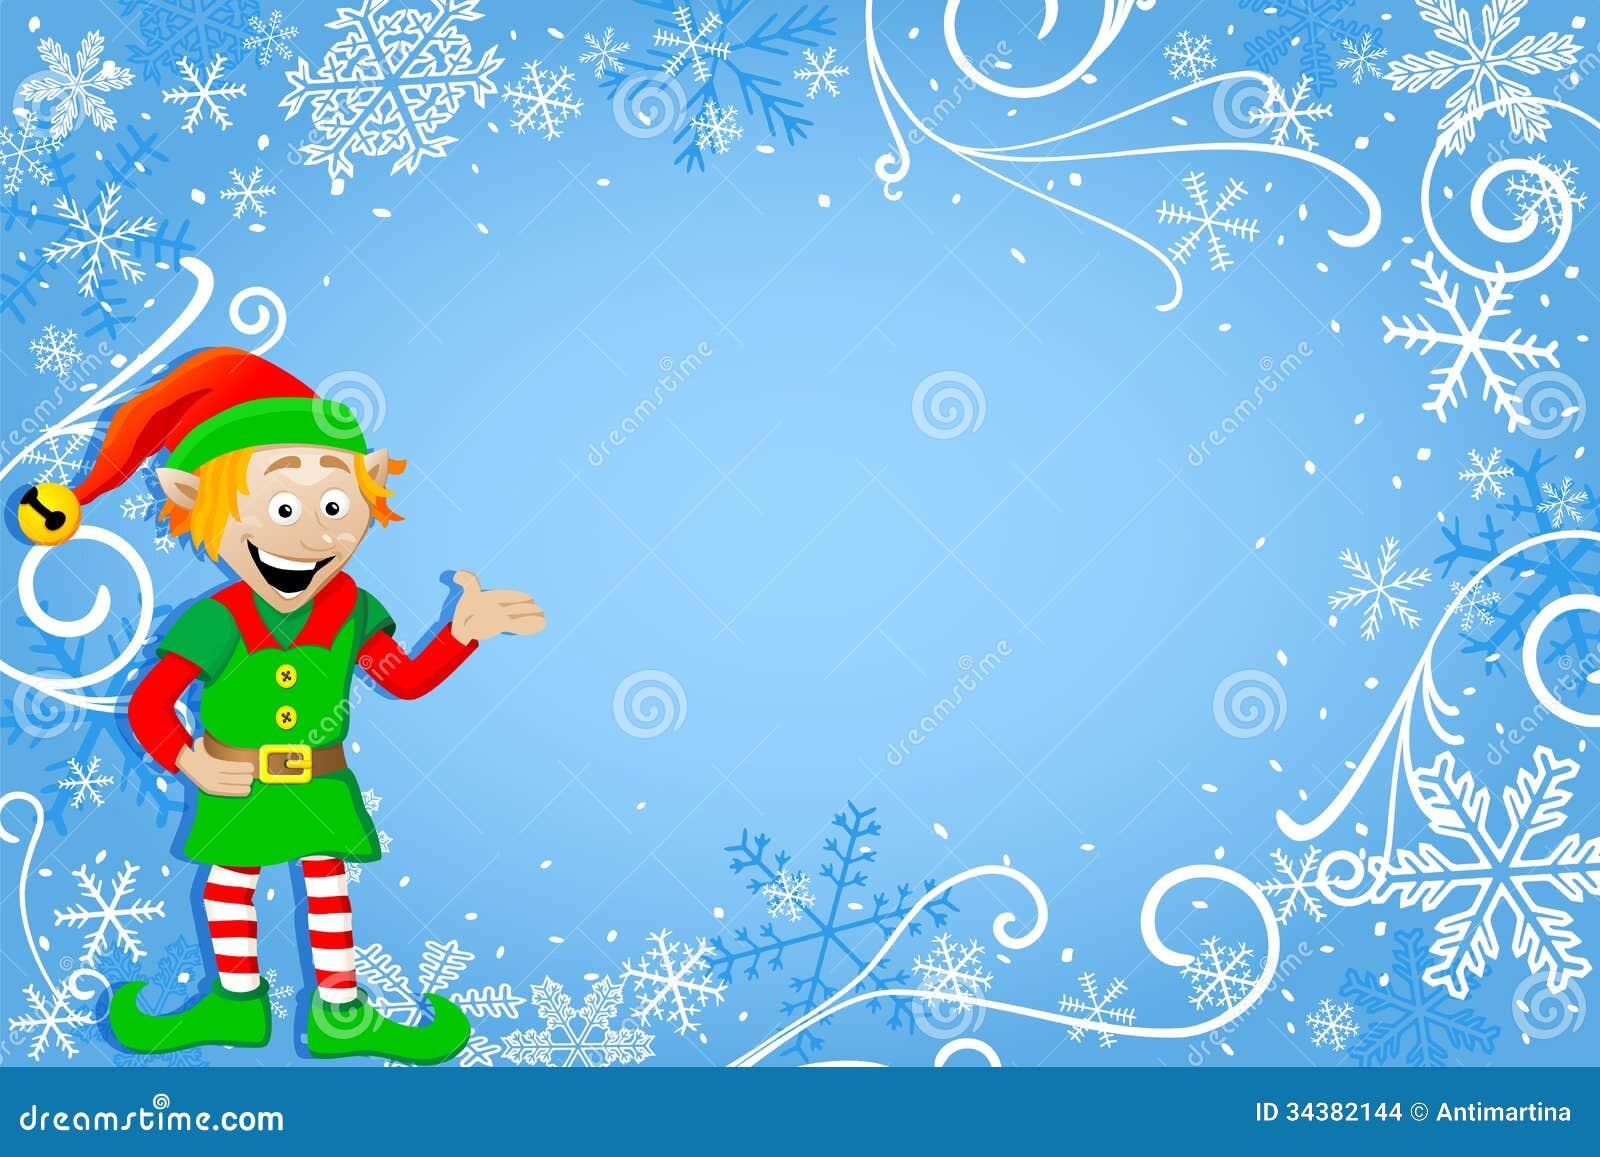 christmas elf wallpaper - photo #30